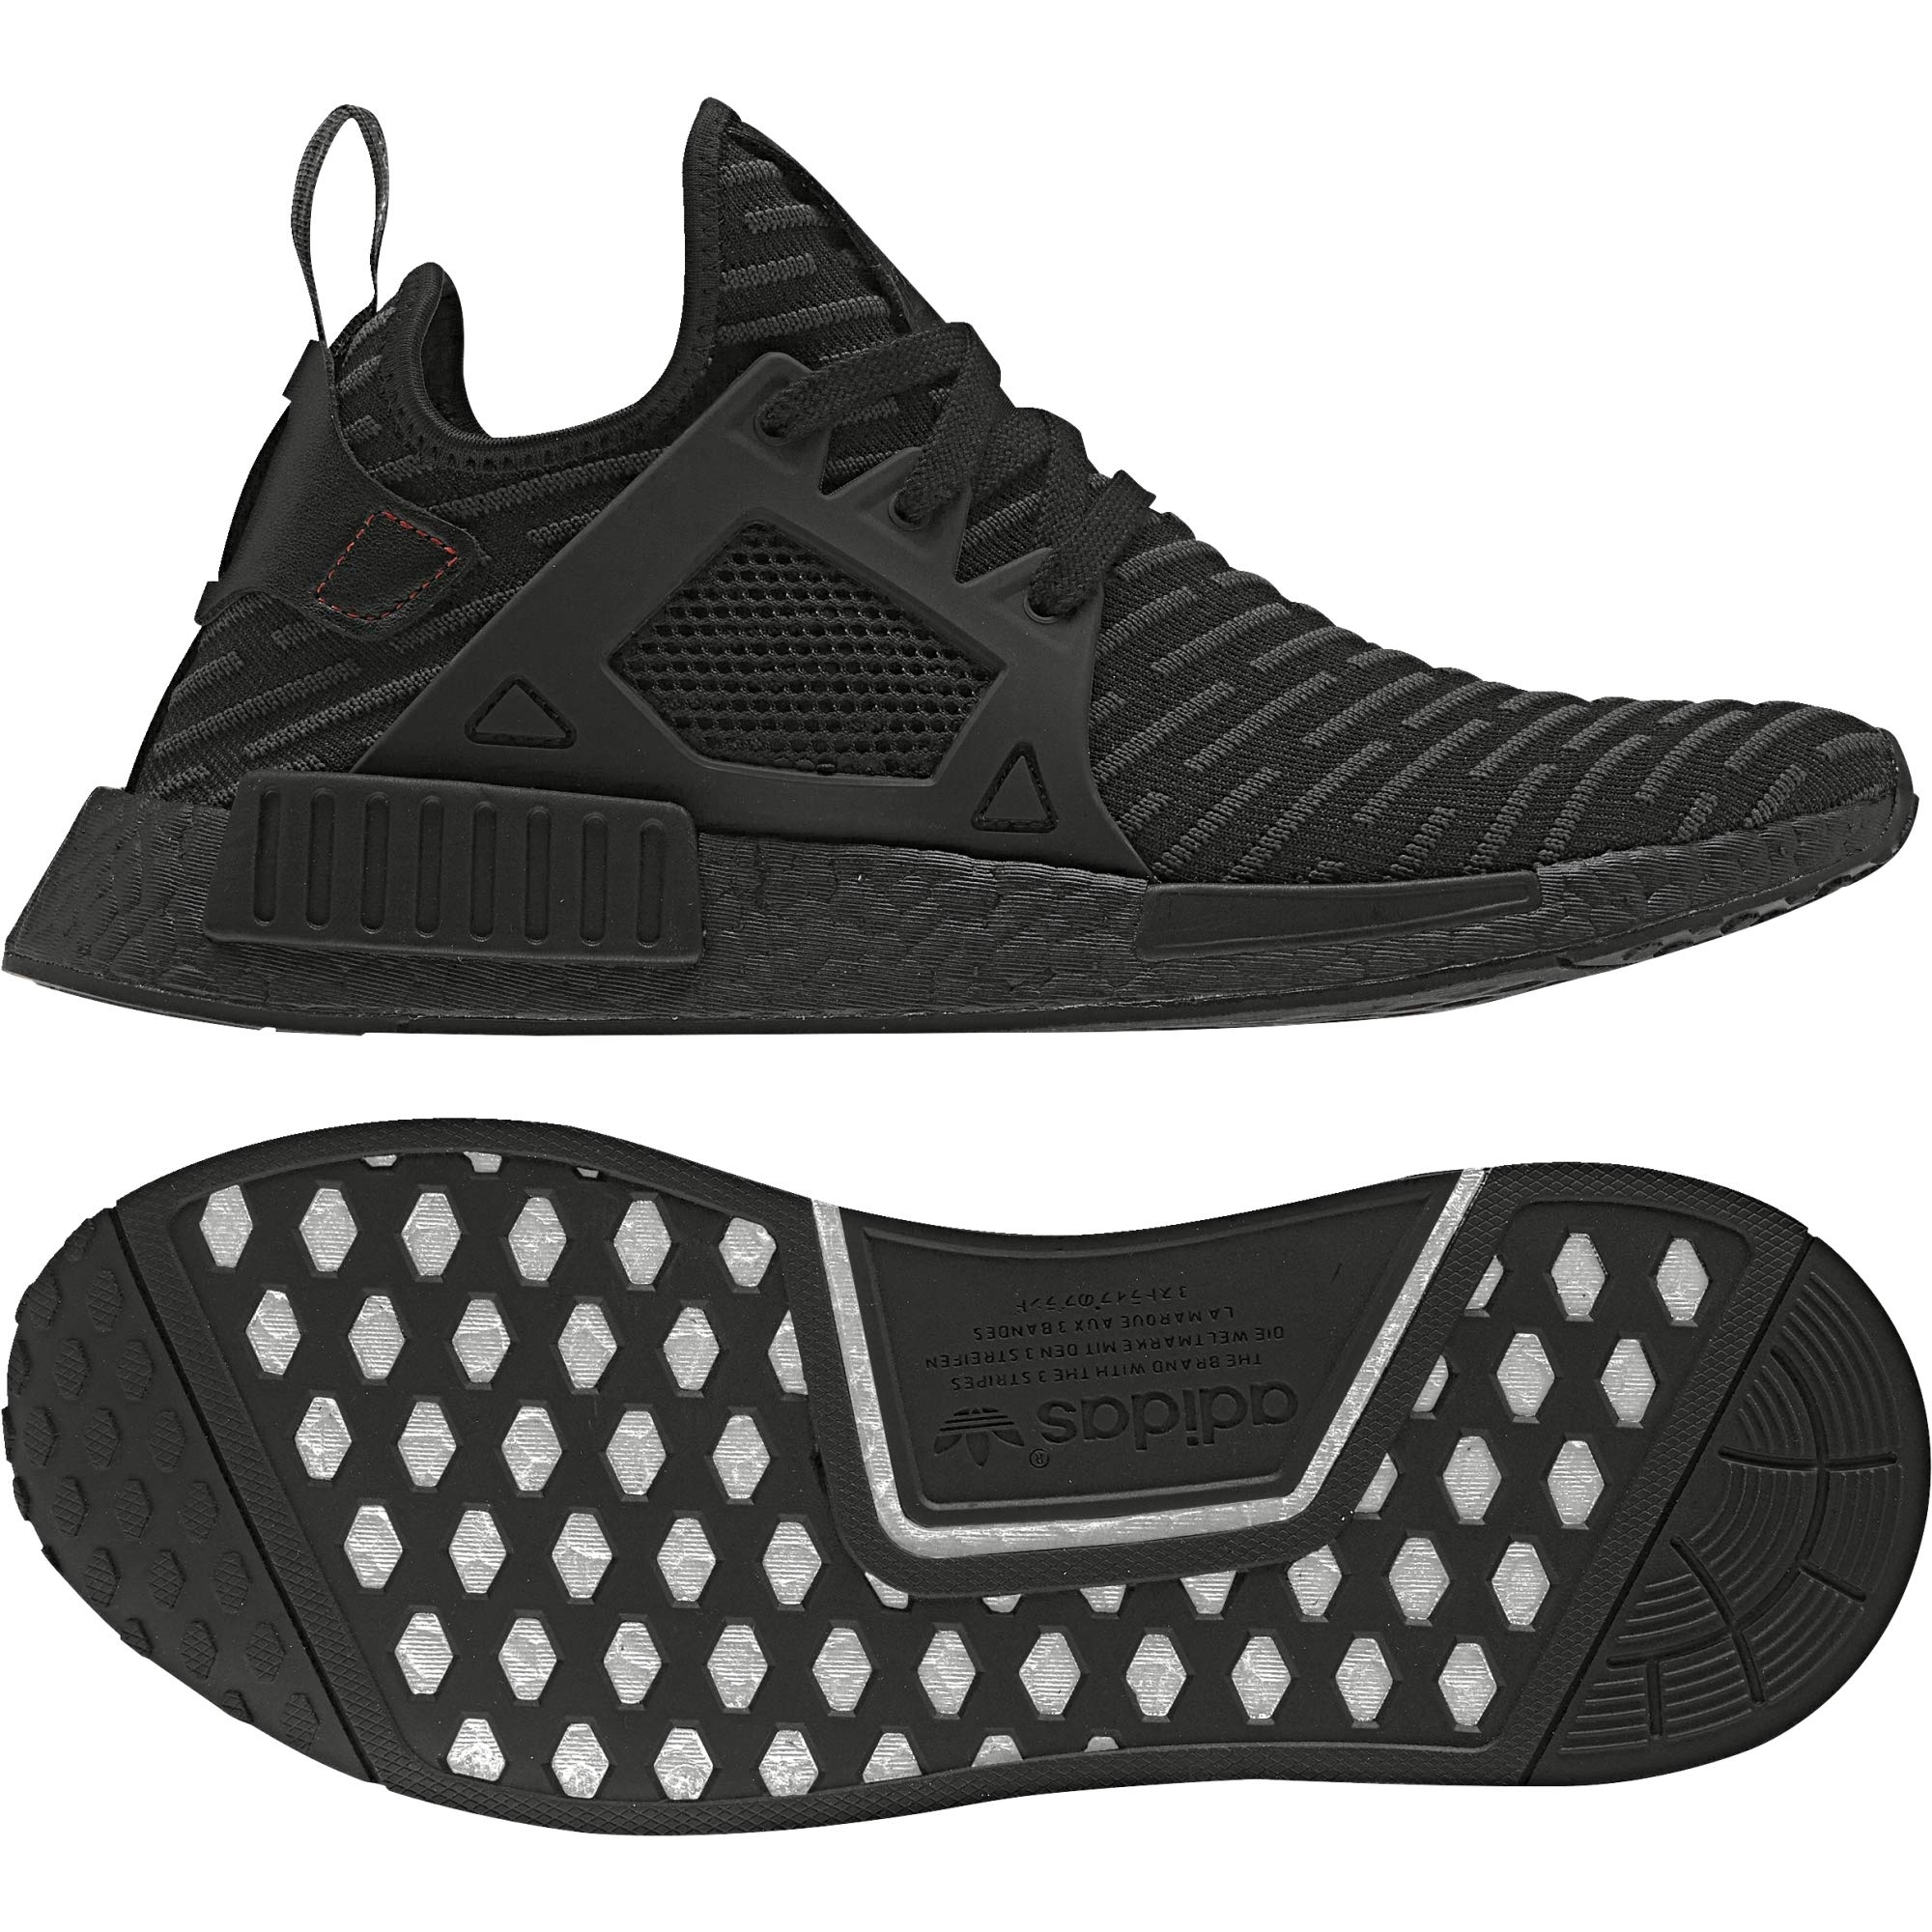 adidas nmd xr1 pk black